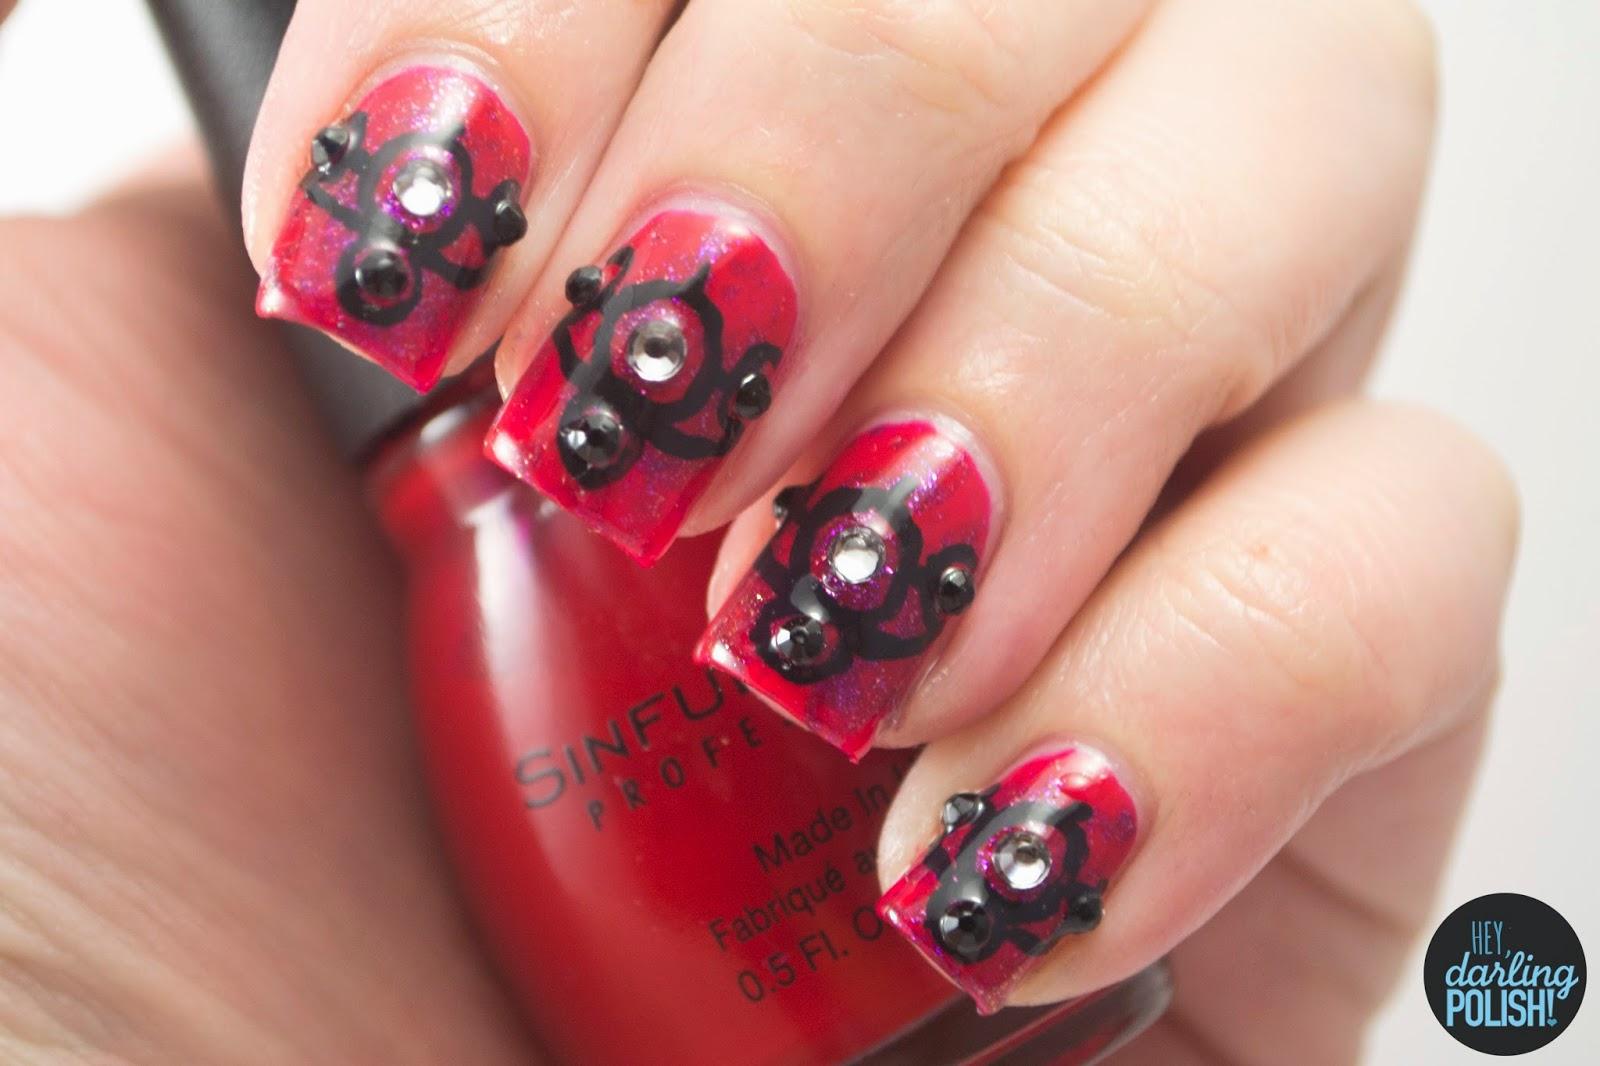 nails, nail art, nail polish, polish, red, black, rhinestones, gothic, hey darling polish, theme buffet